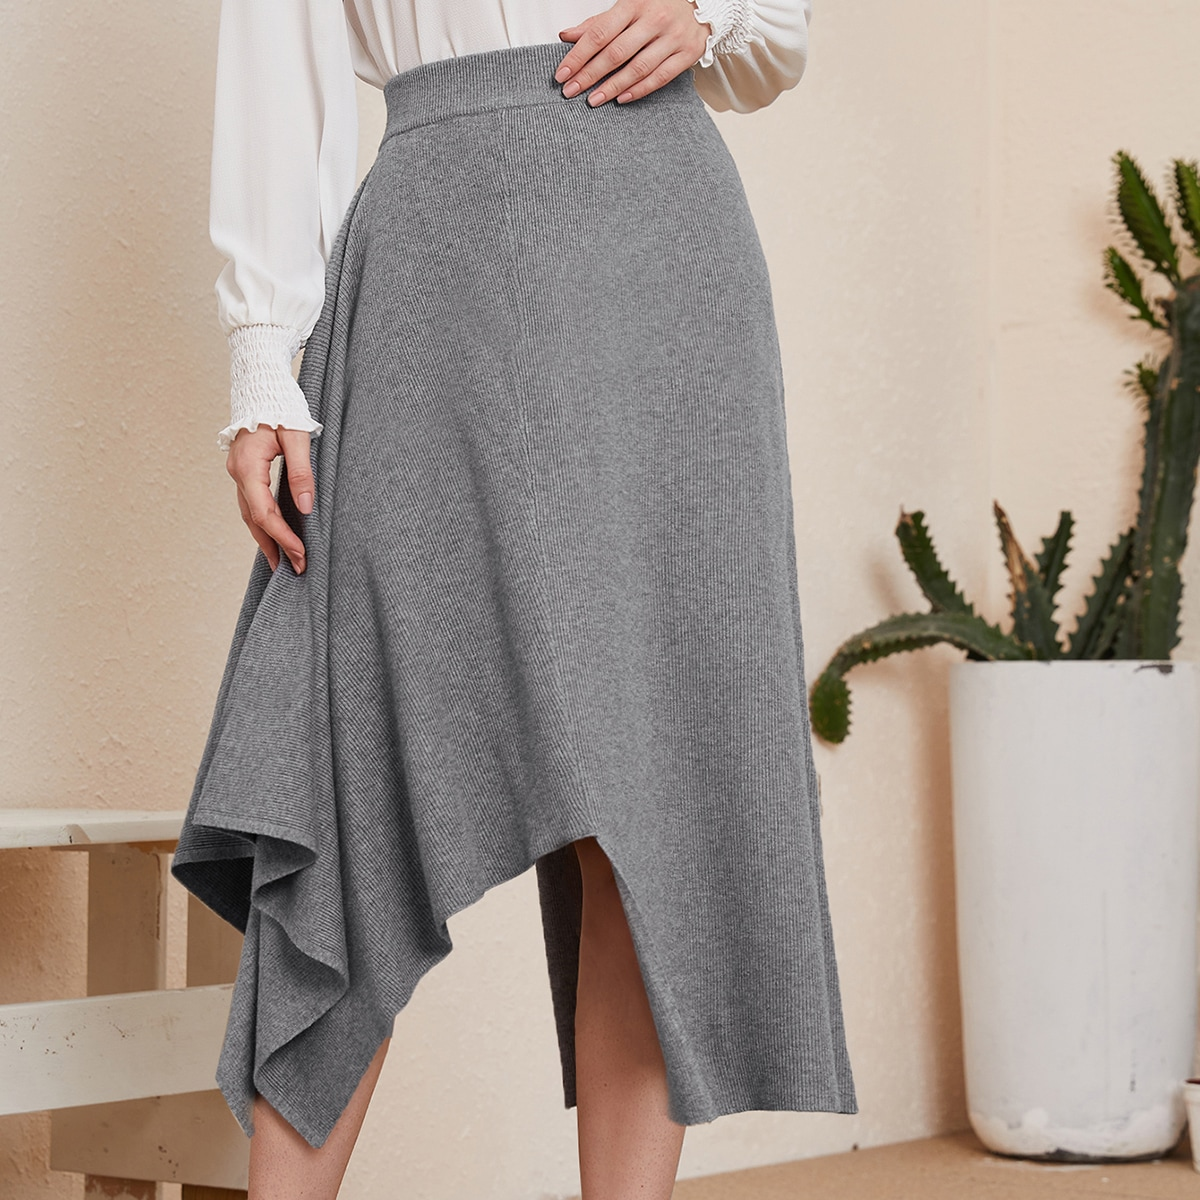 Асимметричная трикотажная юбка